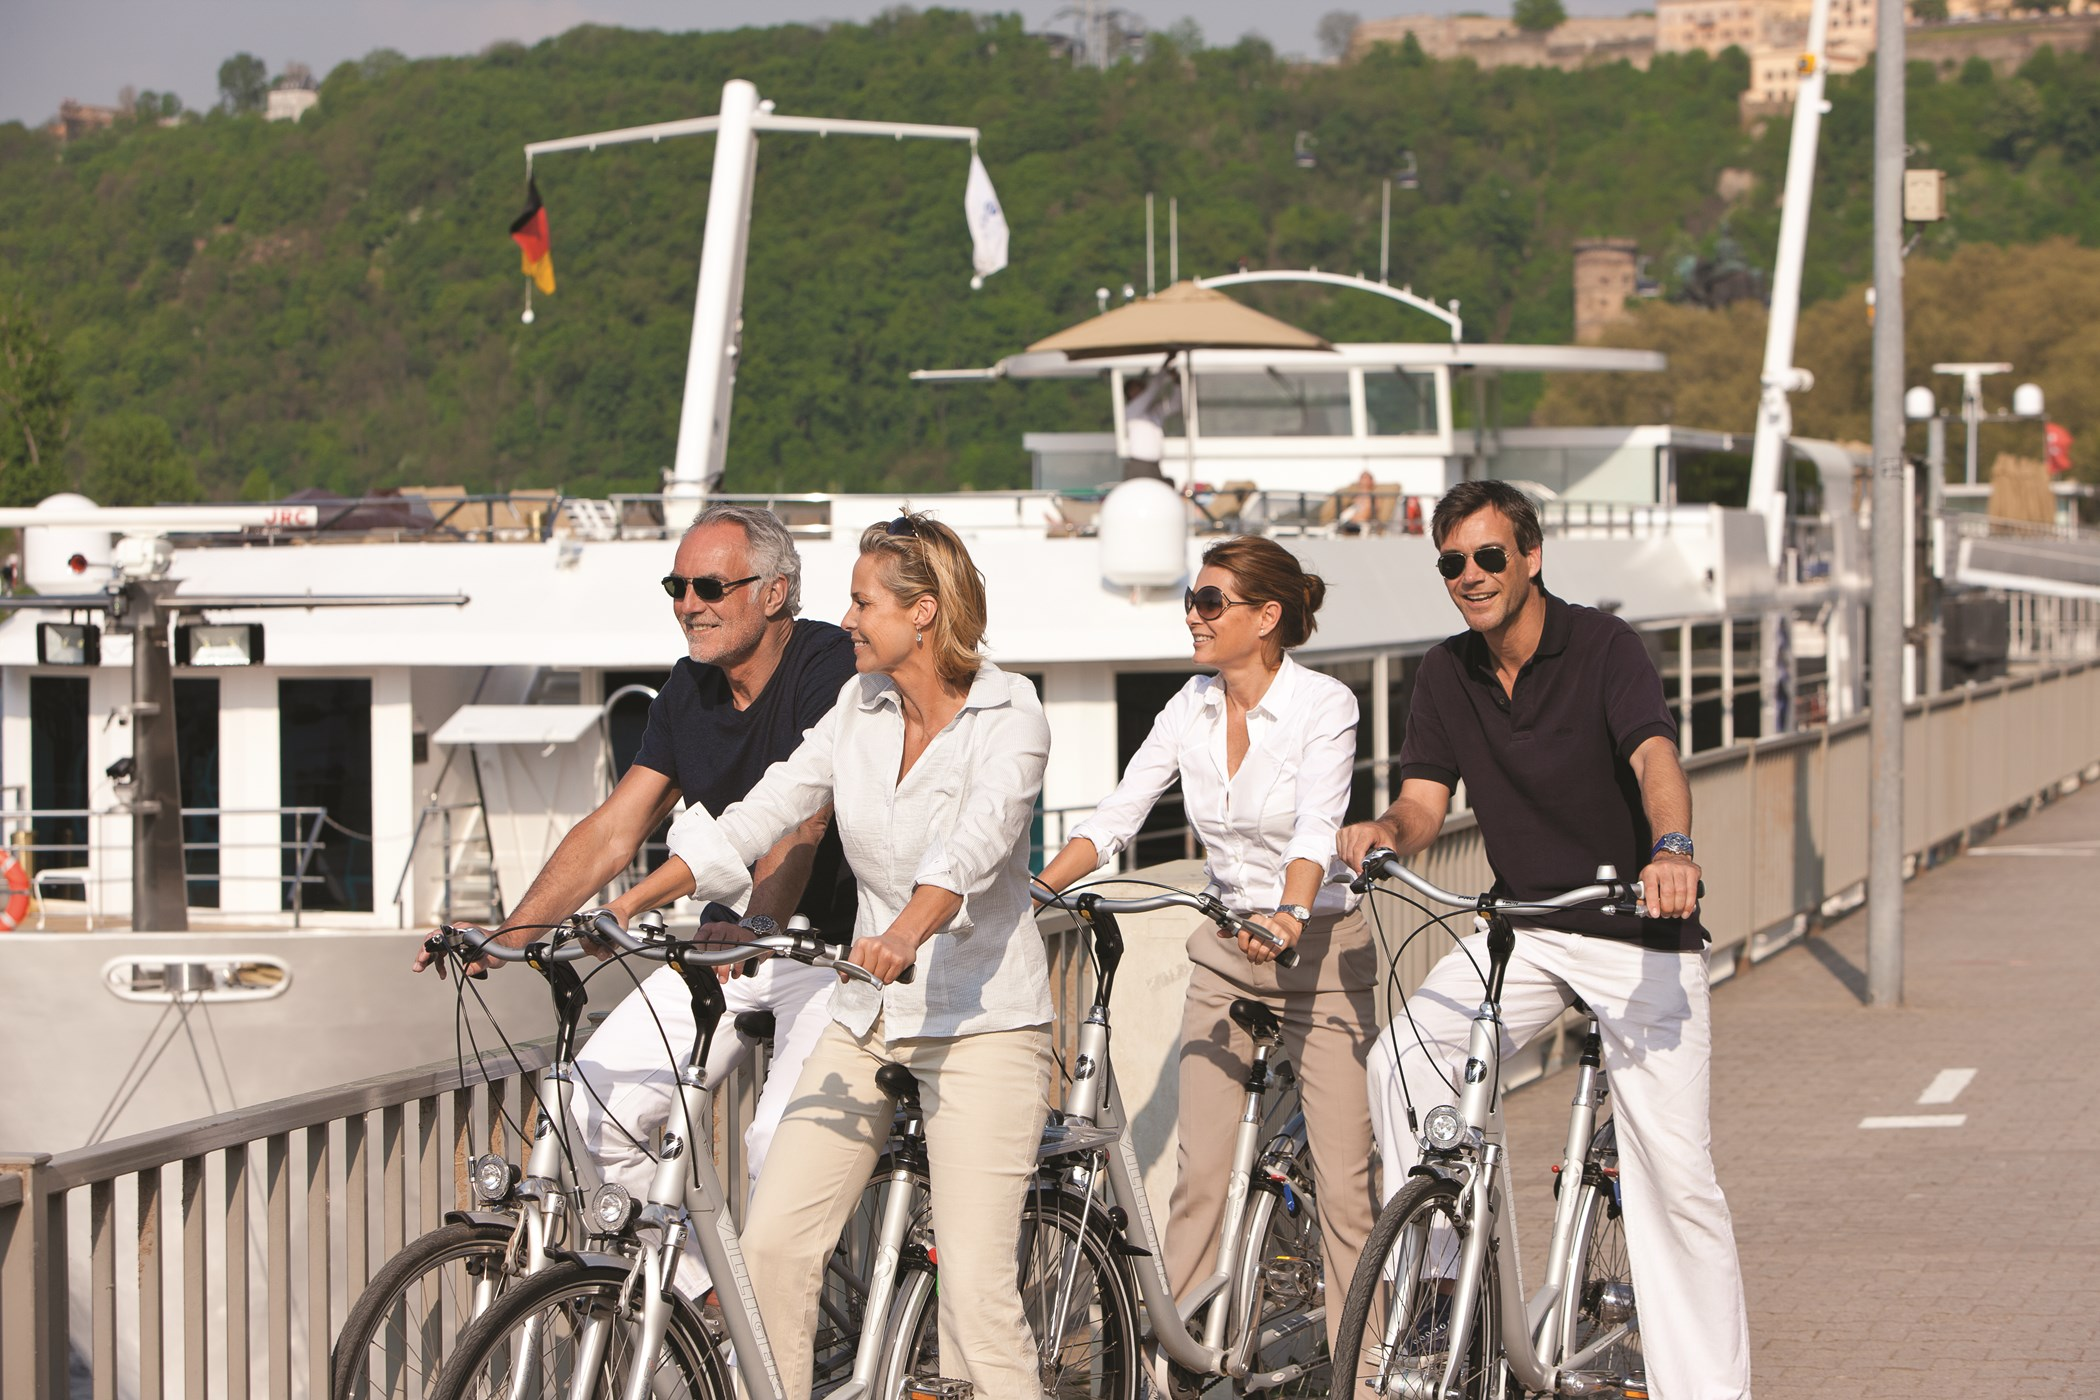 UNIWORLD Boutique River Cruises SS Antoinette Exterior Bikes 1.jpg